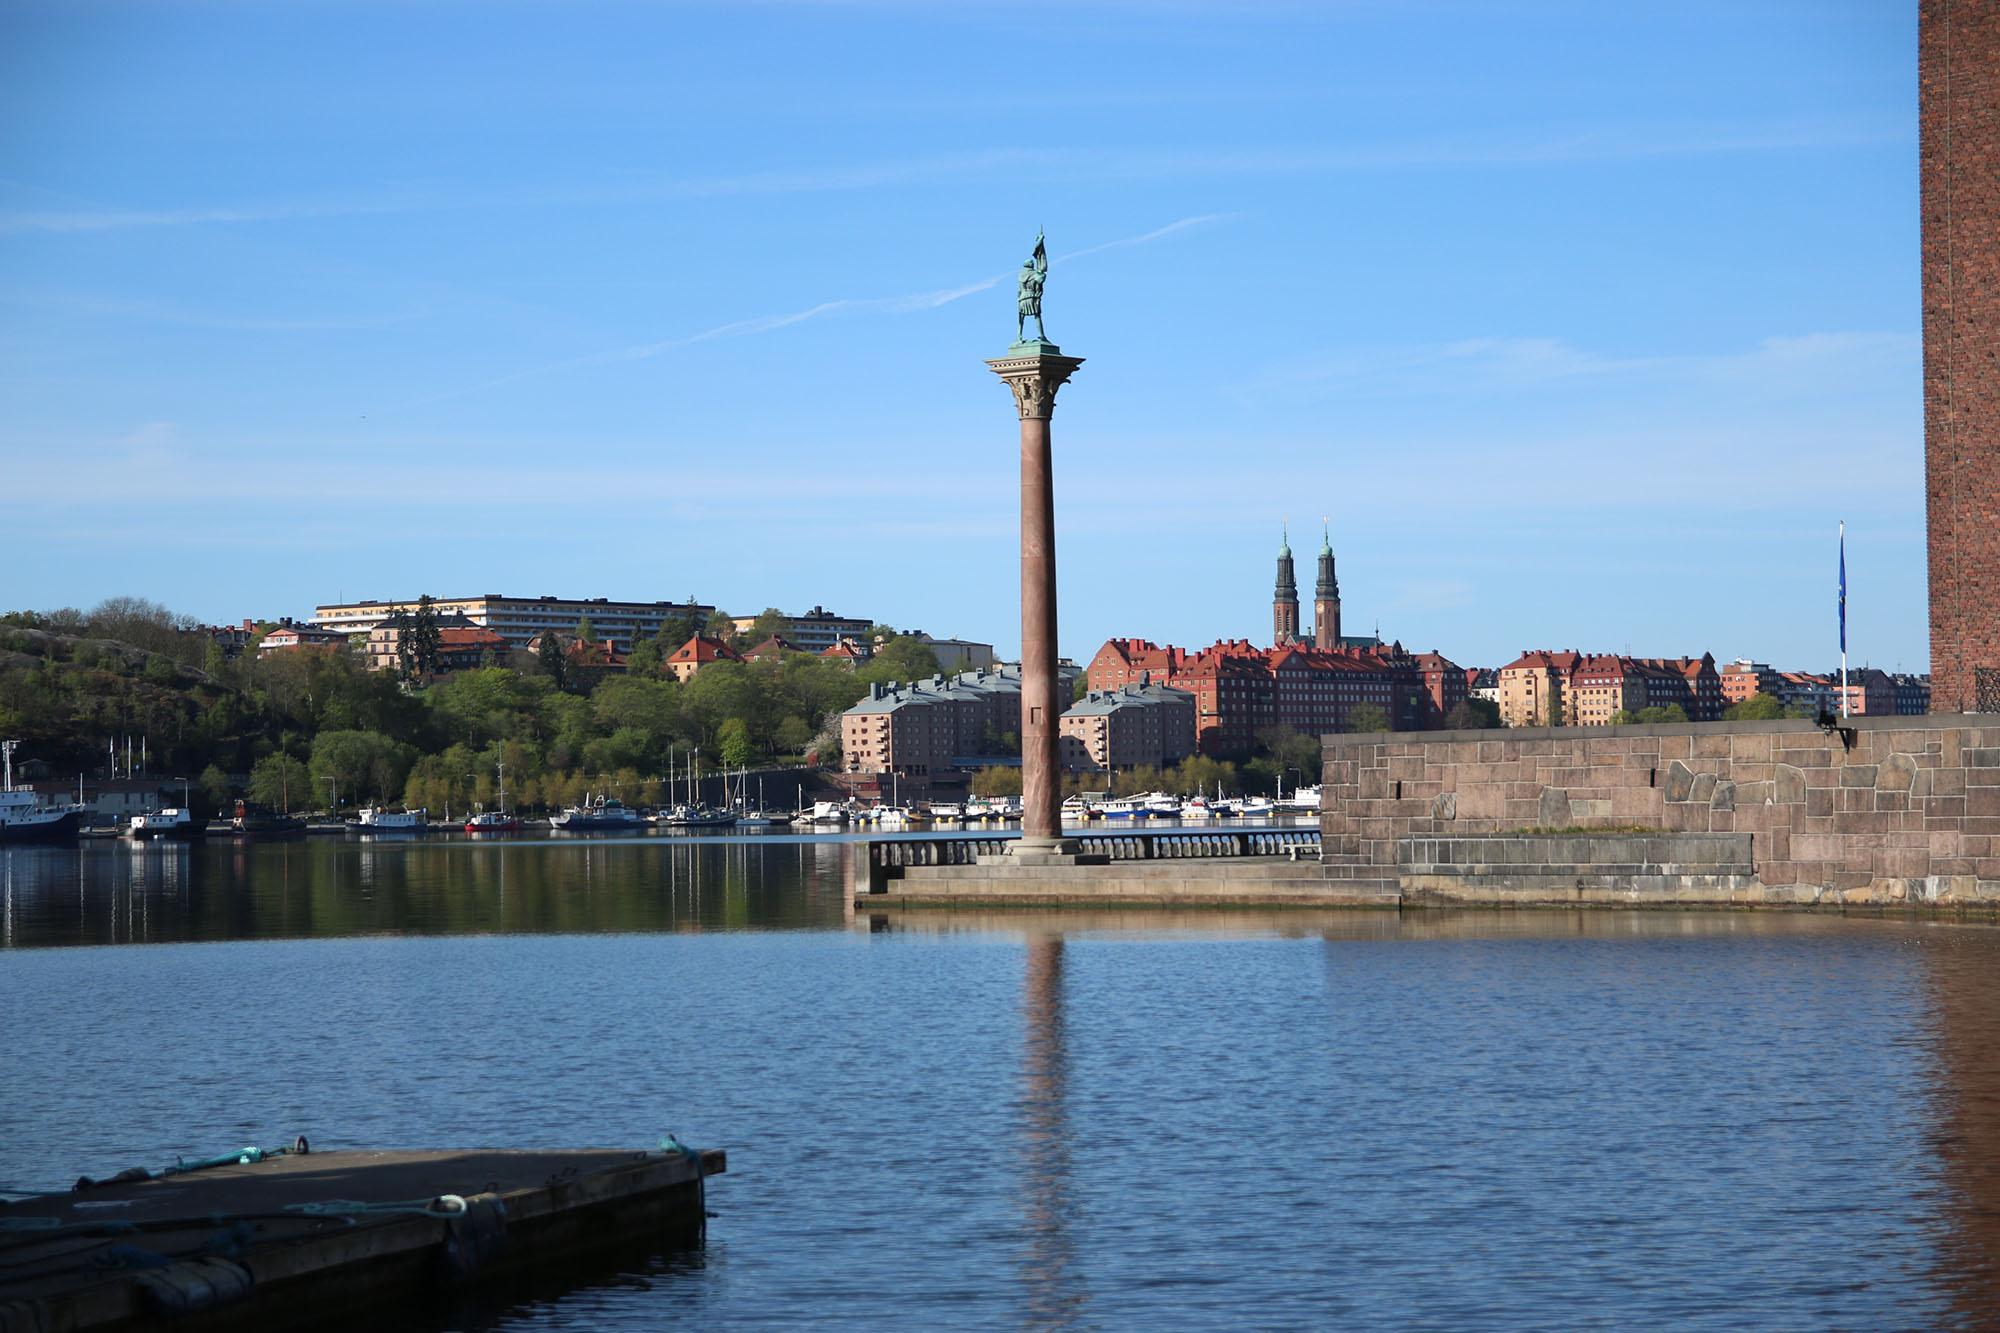 IMG_2951 stockholmshelg x